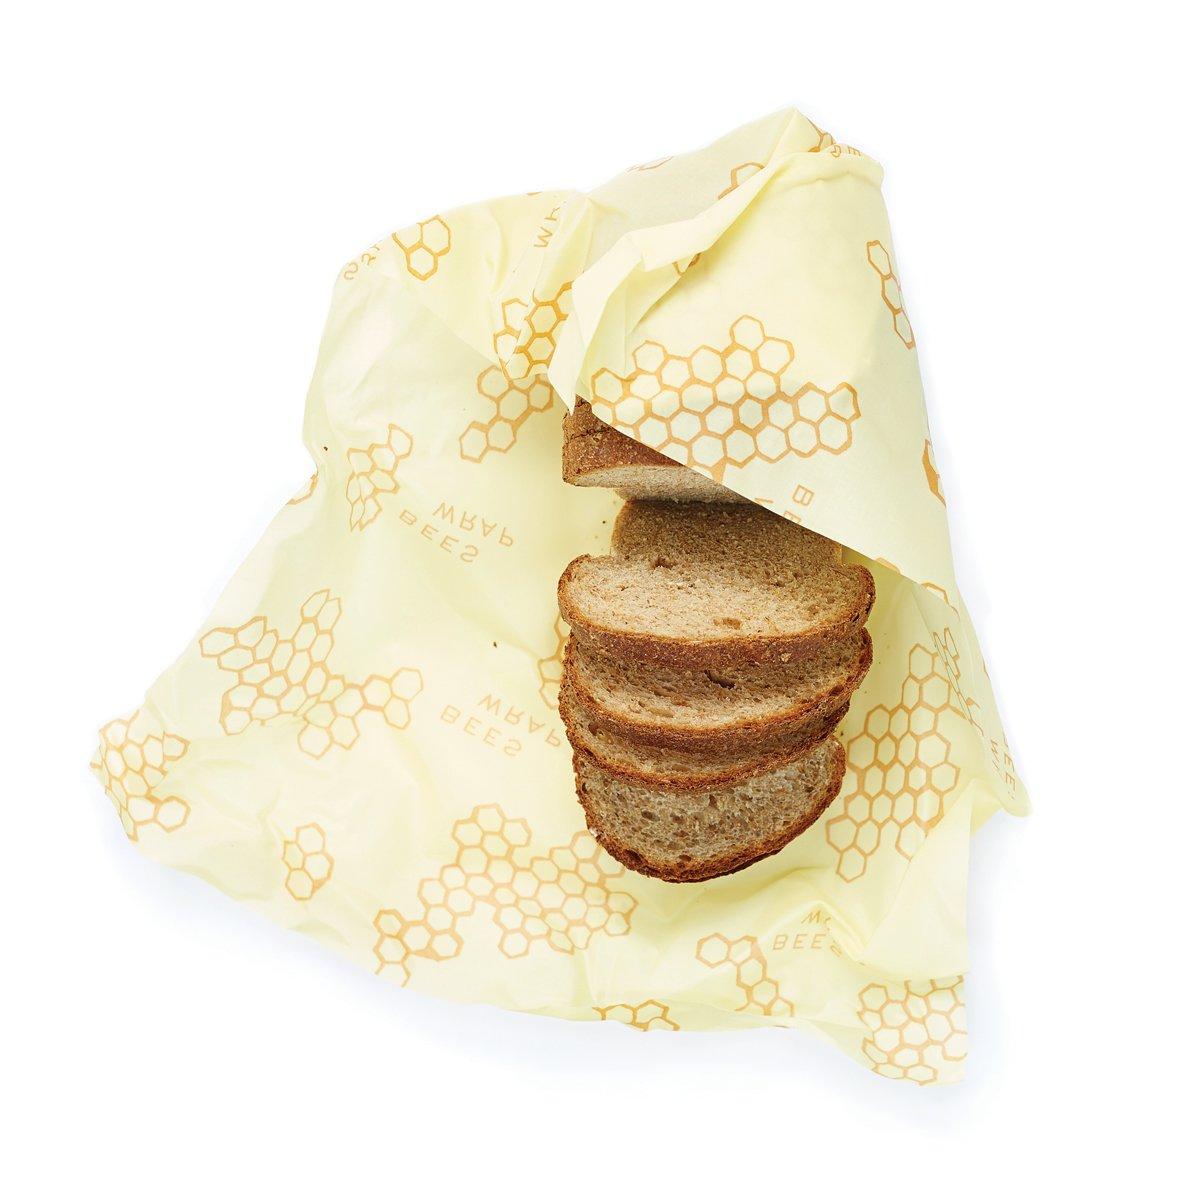 Obal na potraviny Bee's Wrap